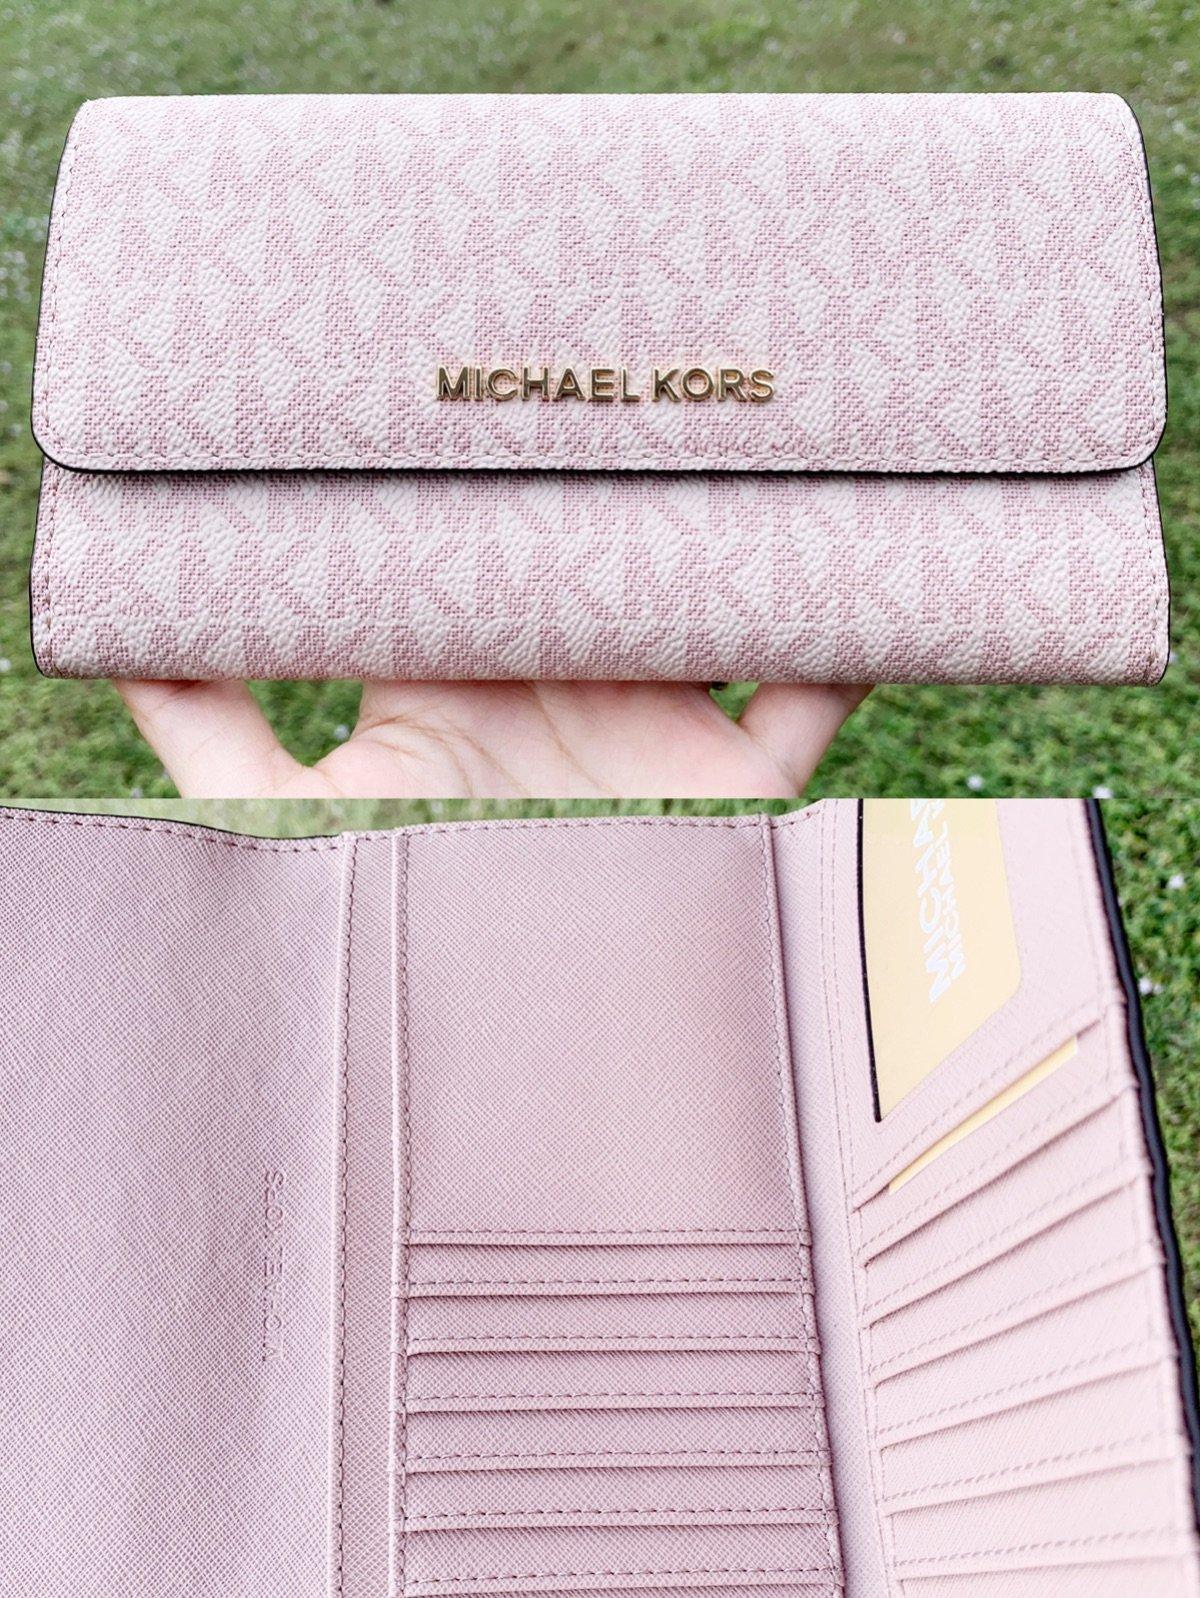 Details about Michael Kors Jet Set Travel PVC Large Trifold Wallet Fawn MK Ballet Pink